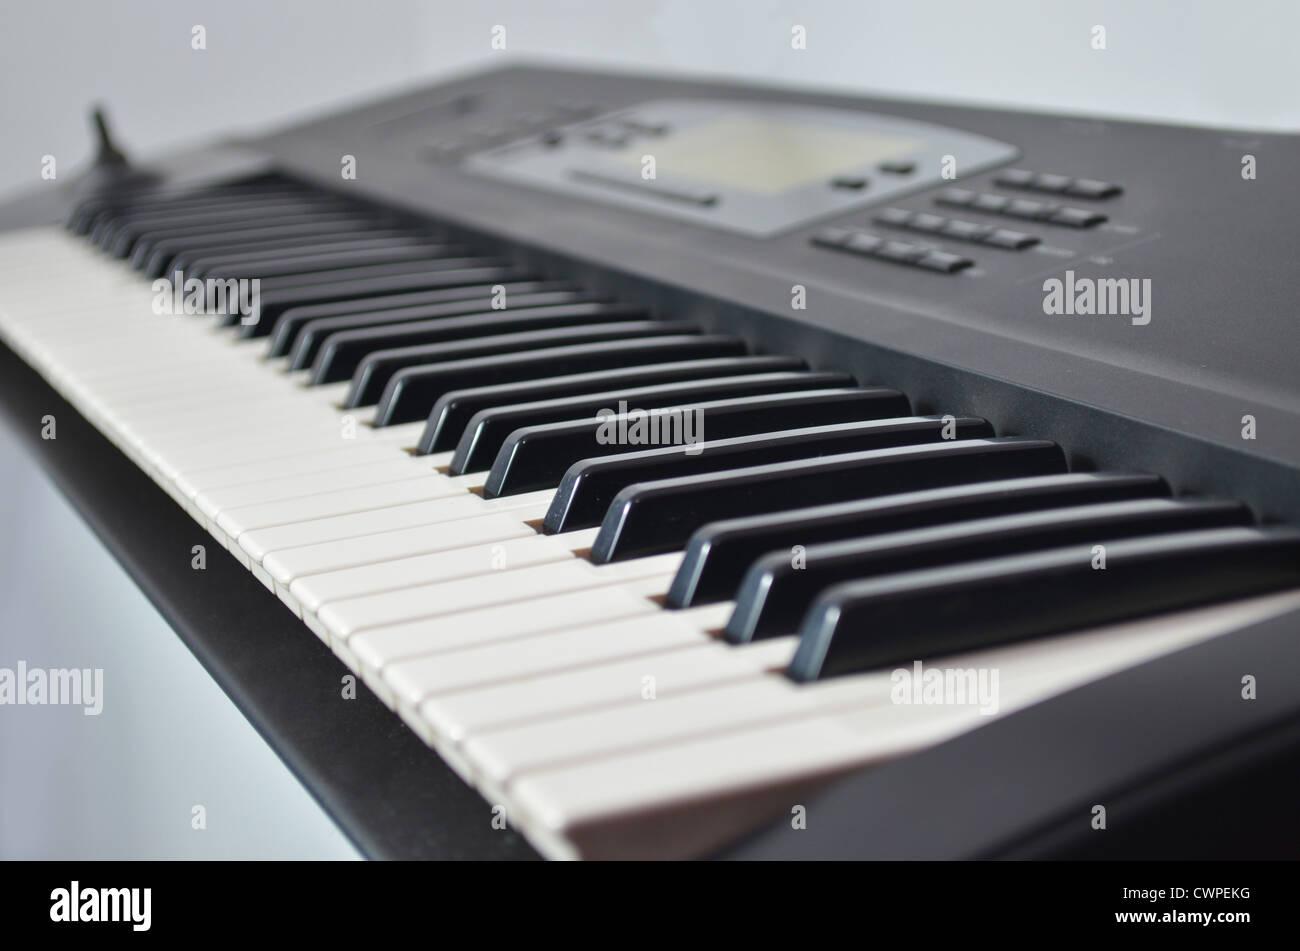 Electronic synthesizer keyboard. Musical instrument - Stock Image